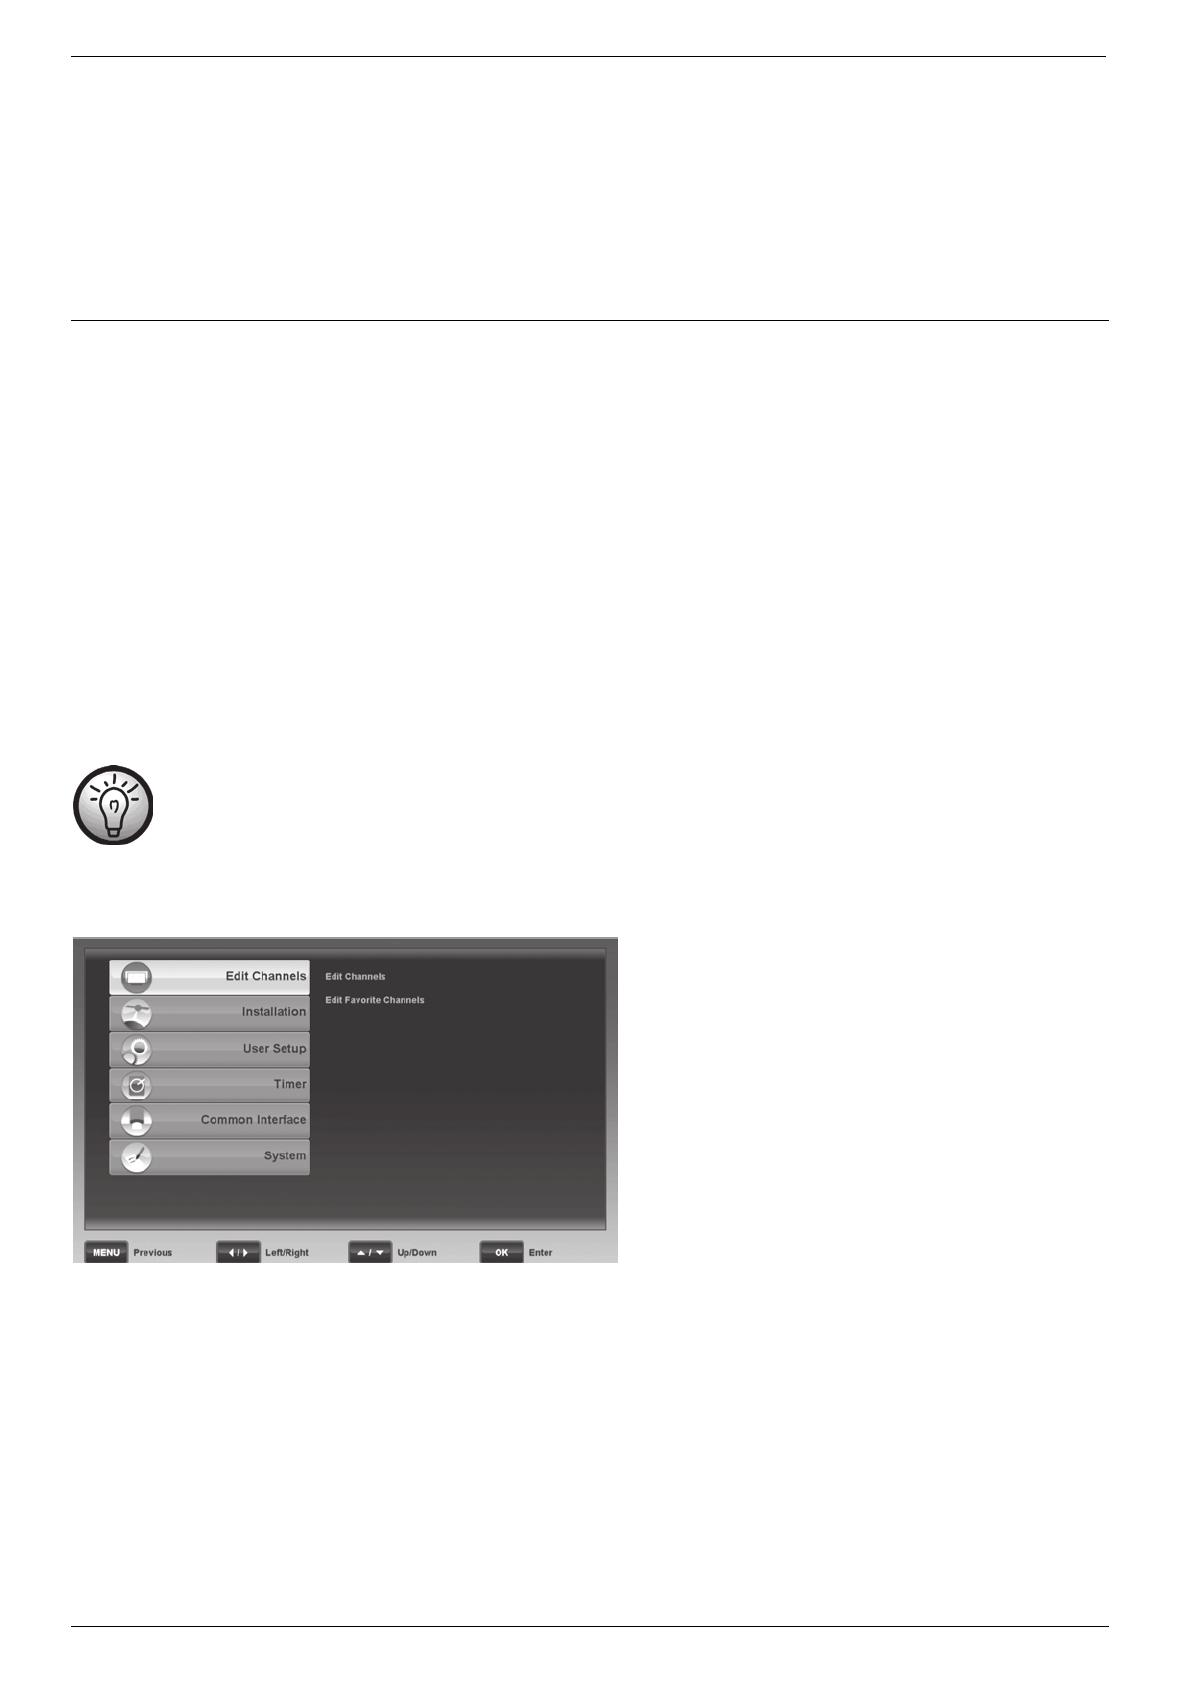 Handleiding Silvercrest SSR 1080 B2 (pagina 109 van 140) (Deutsch